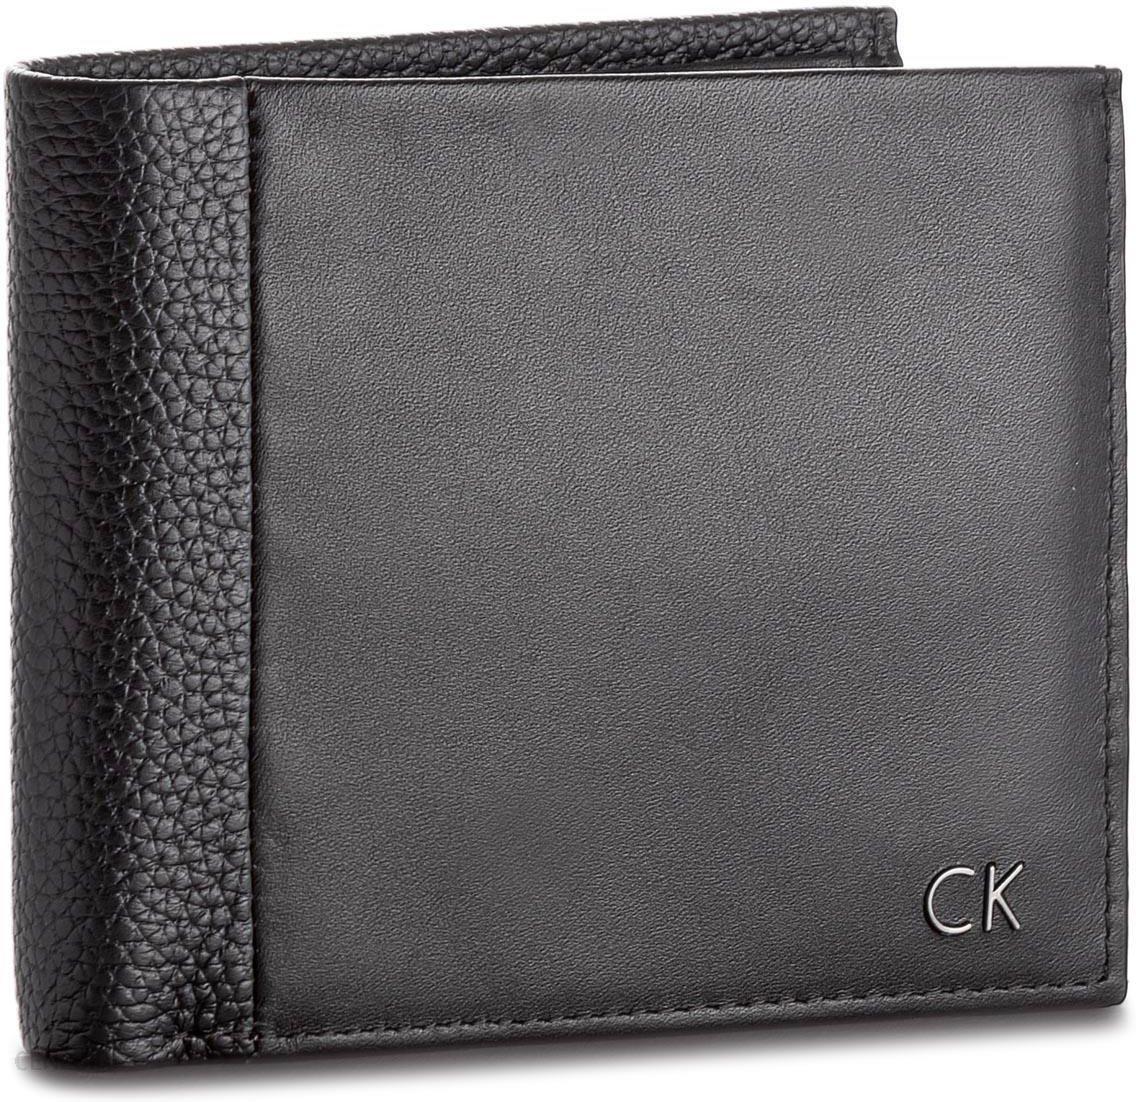 05617c1c0f1b5 Duży Portfel Męski CALVIN KLEIN BLACK LABEL - New Nathan 10CC+Coin  K50K503558 001 -